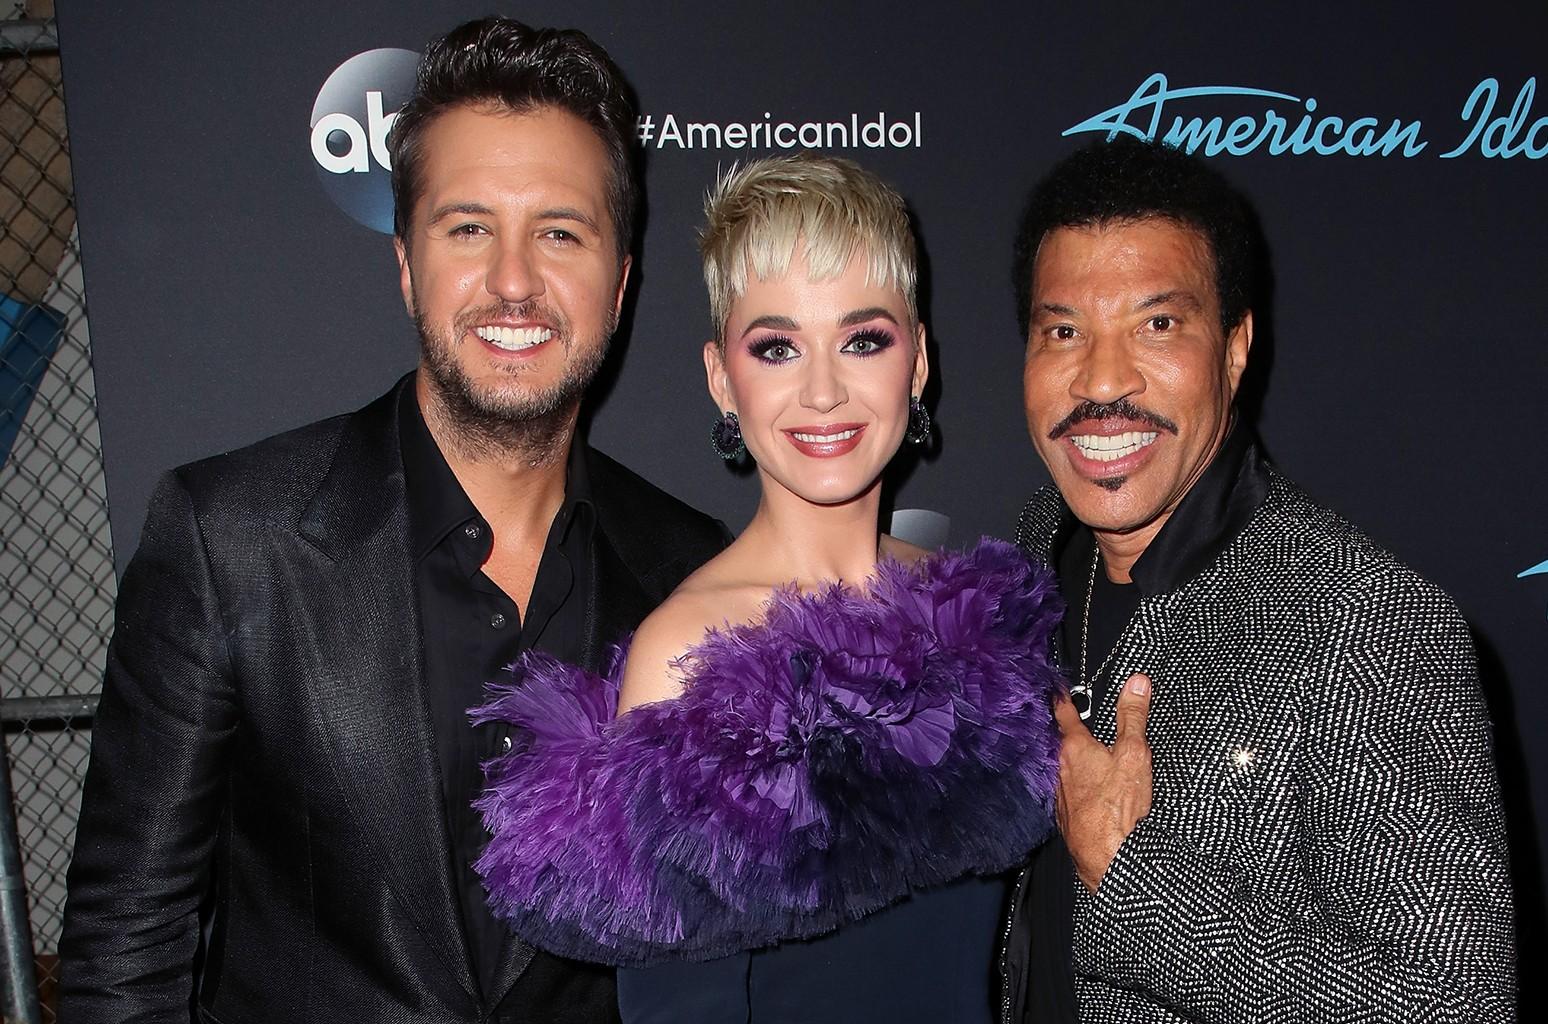 Luke Bryan, Katy Perry Lionel Richie